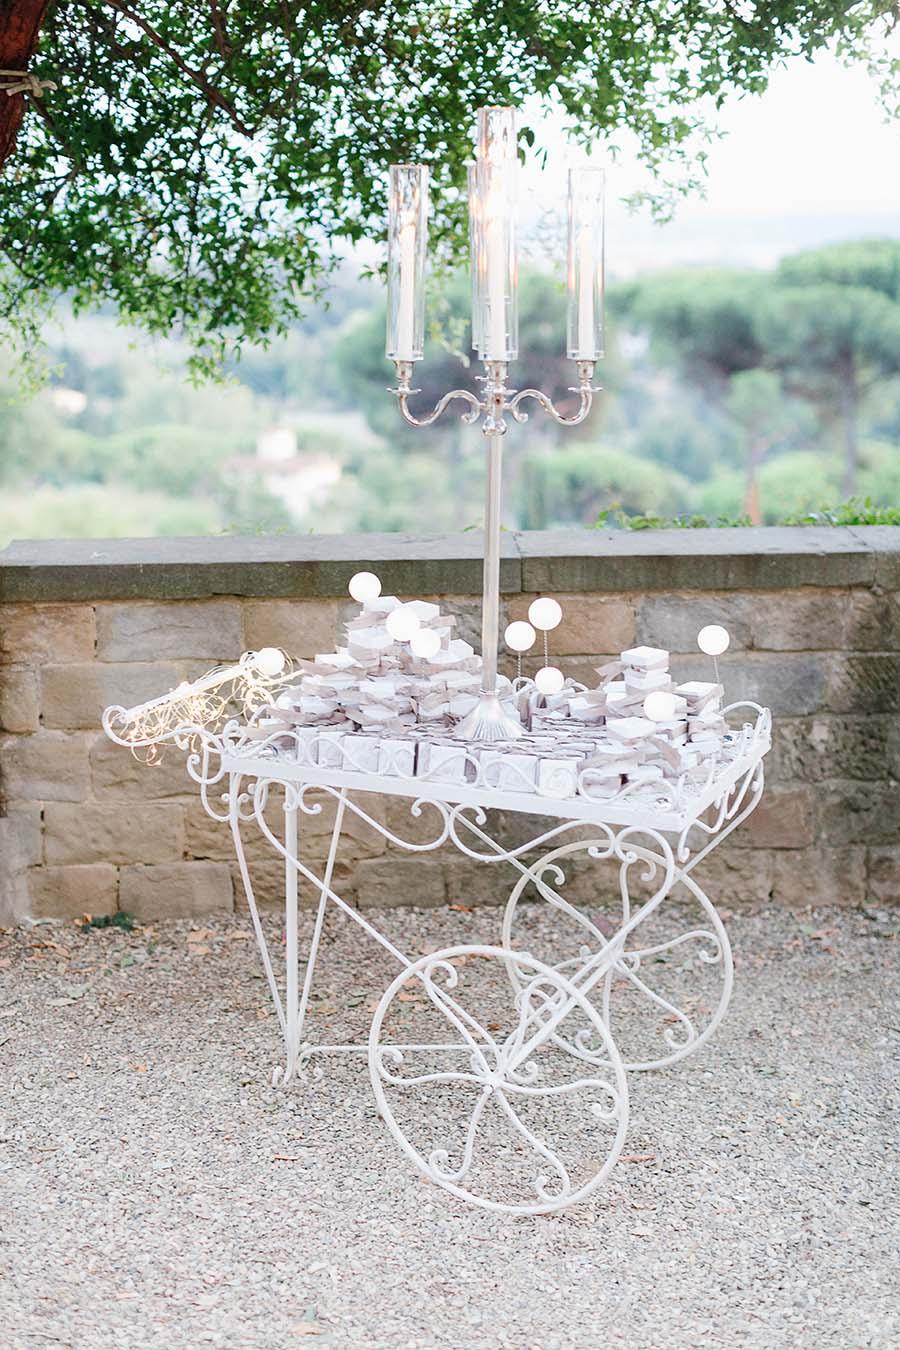 villa-le-fontanelle-wedding-photographer-ilaria-petrucci-marco-severine-711